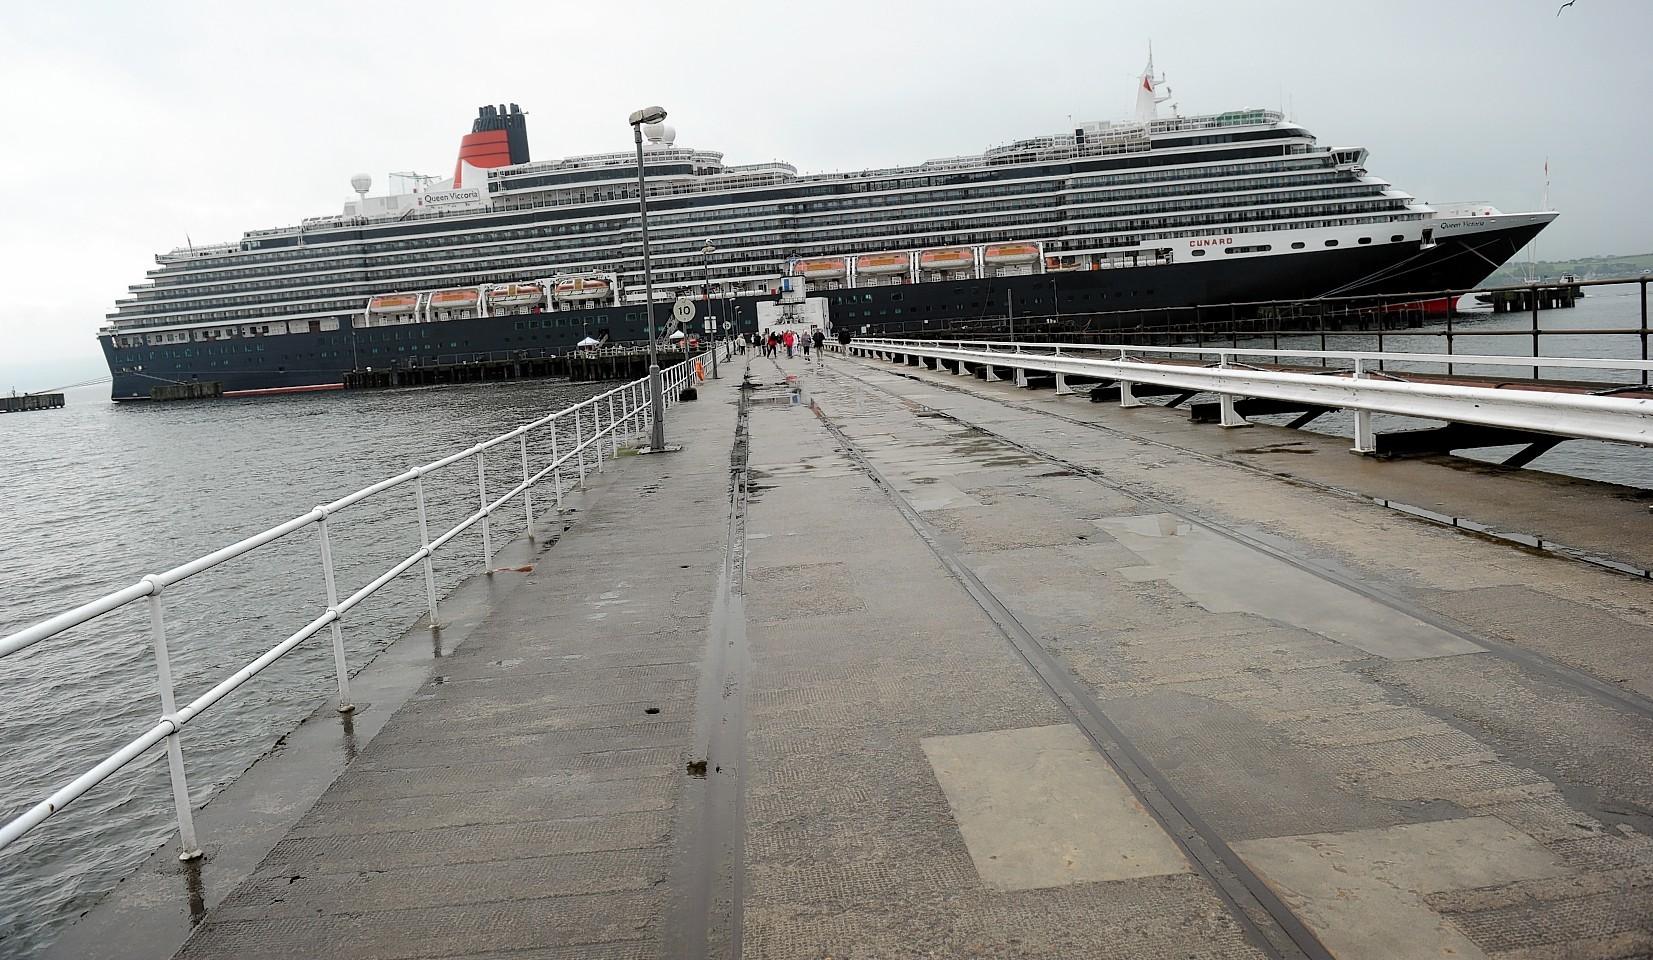 Queen Elizabeth touring ship at Invergordon